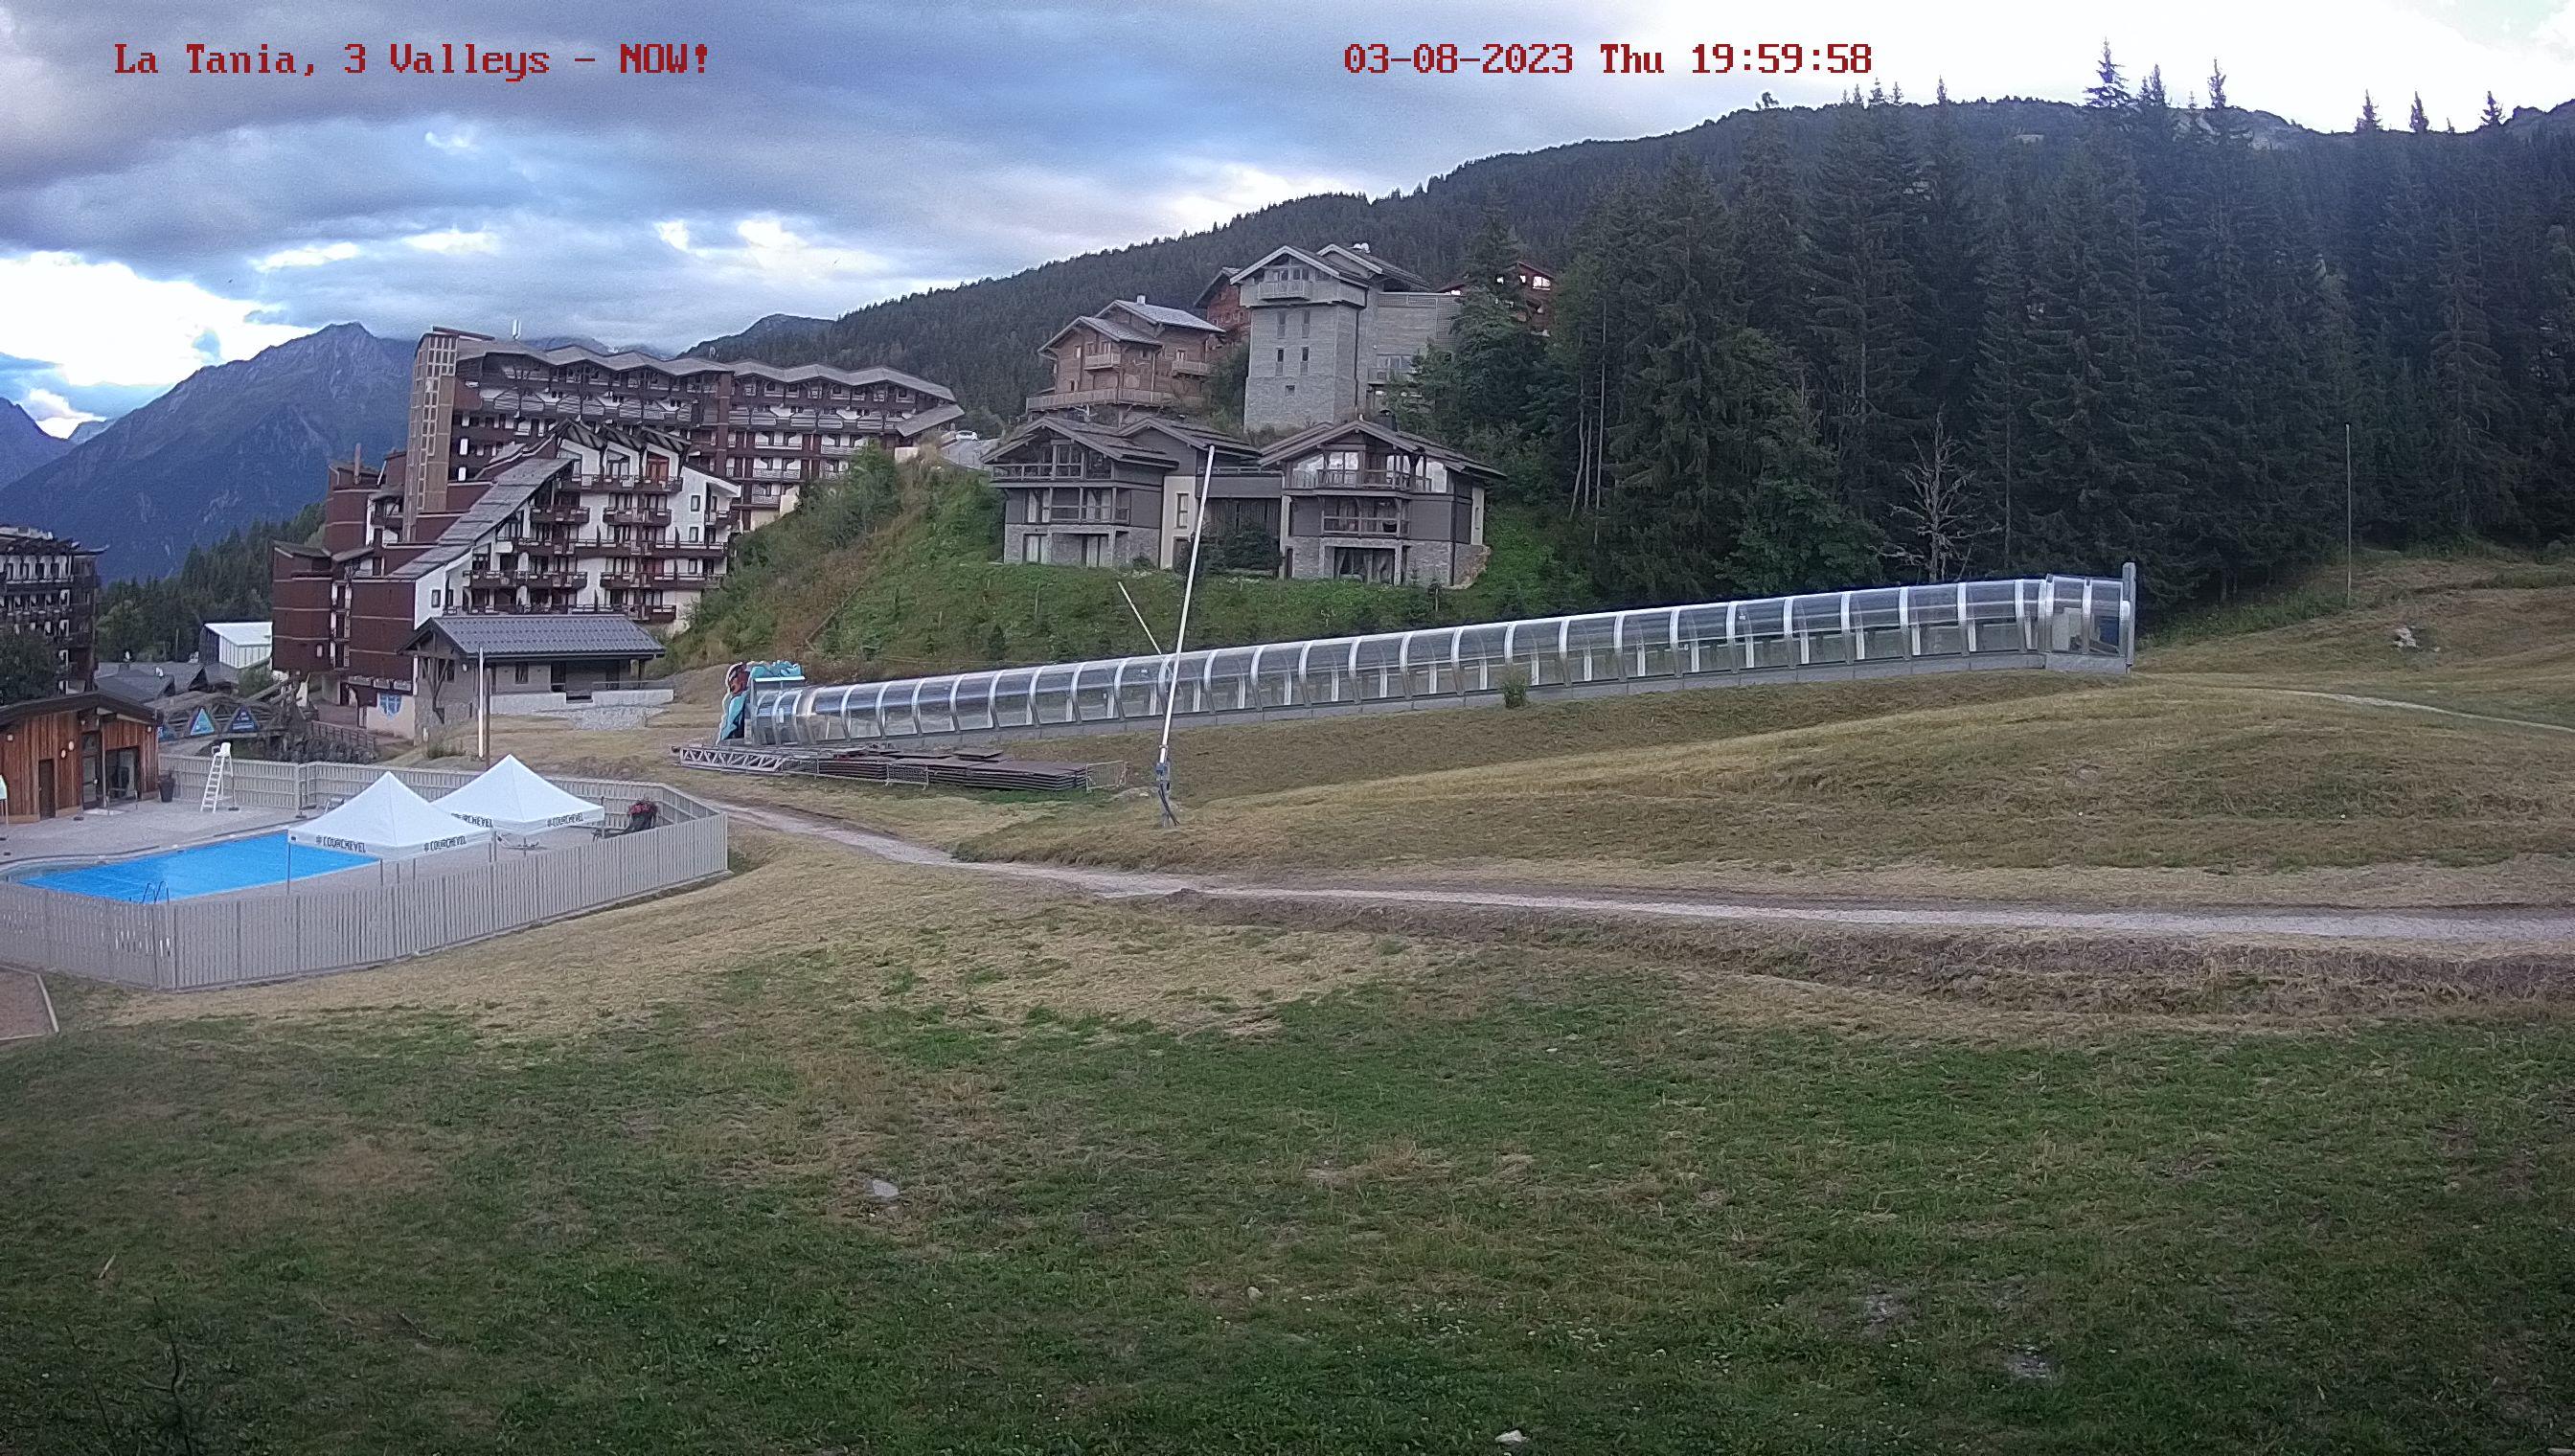 latania.co.uk/webcams